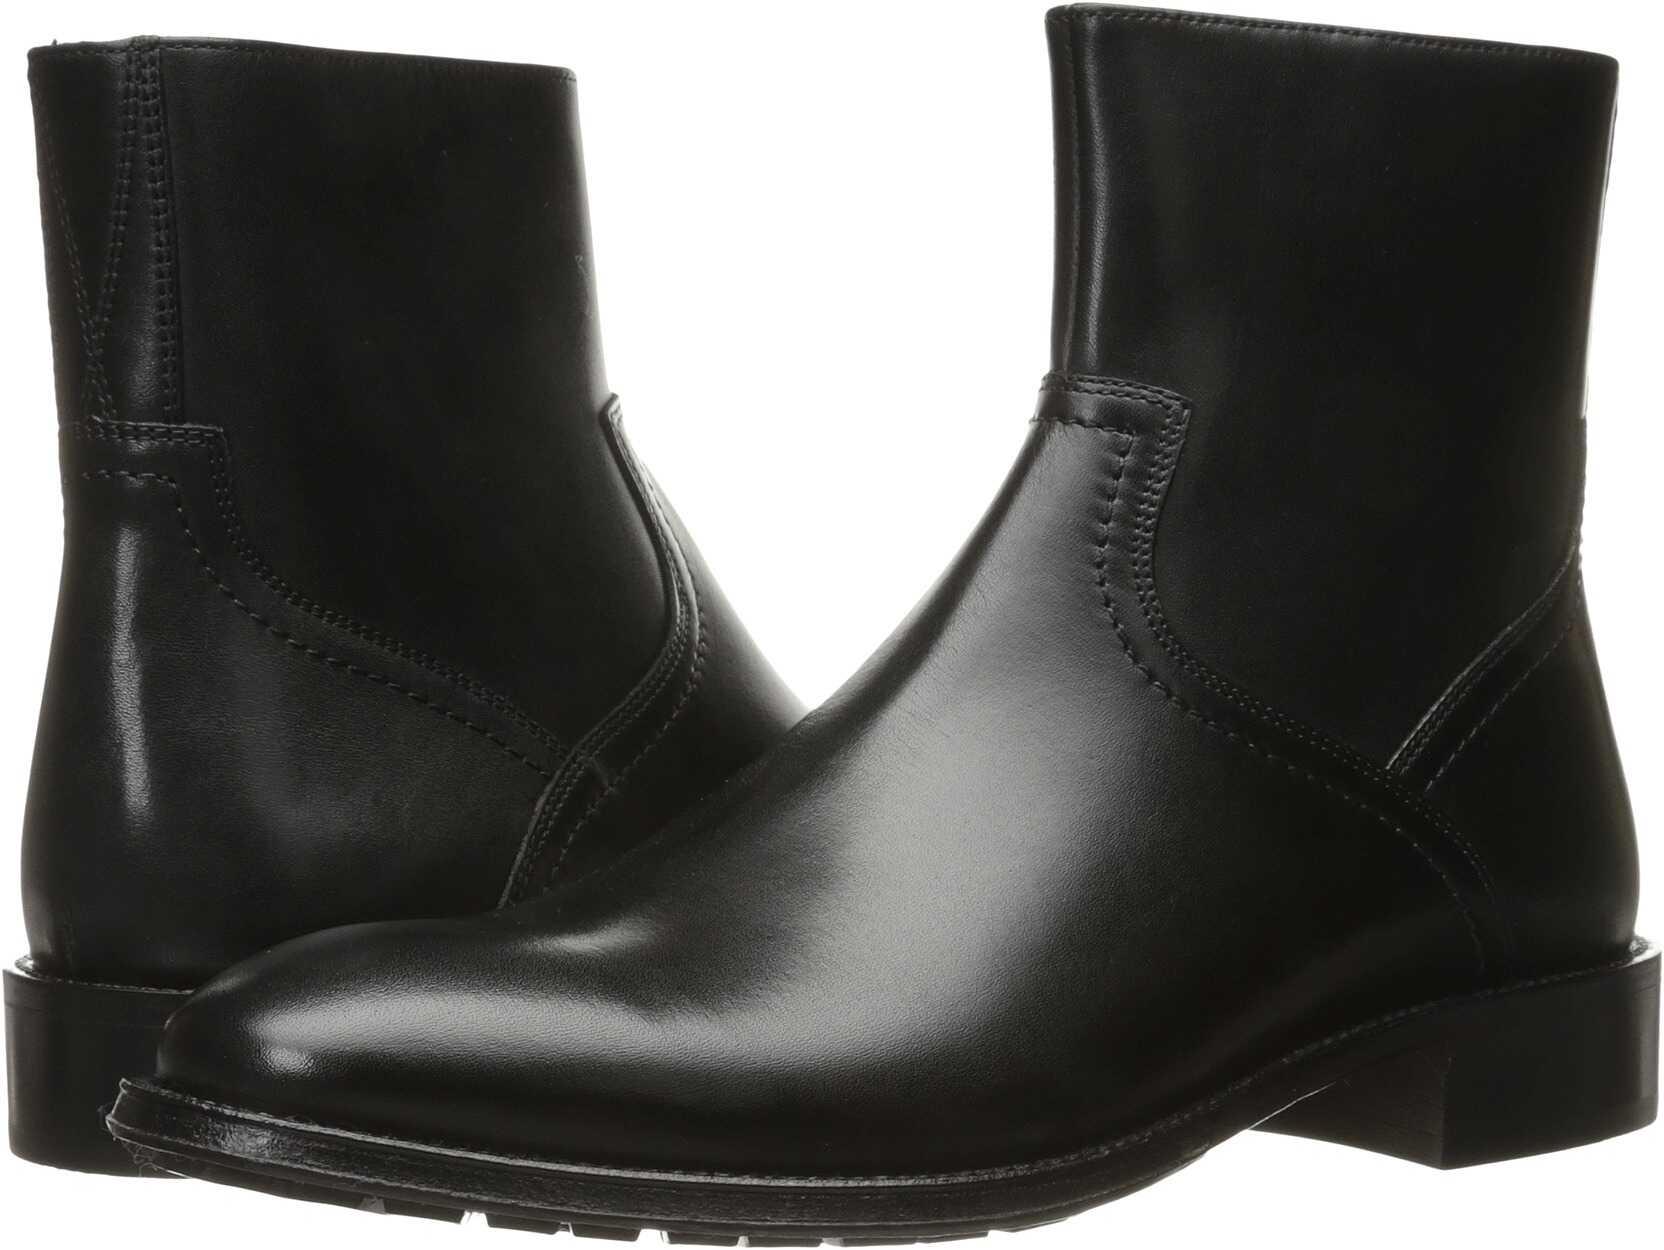 Florsheim Capital Plain Toe Zip Boot Black Smooth